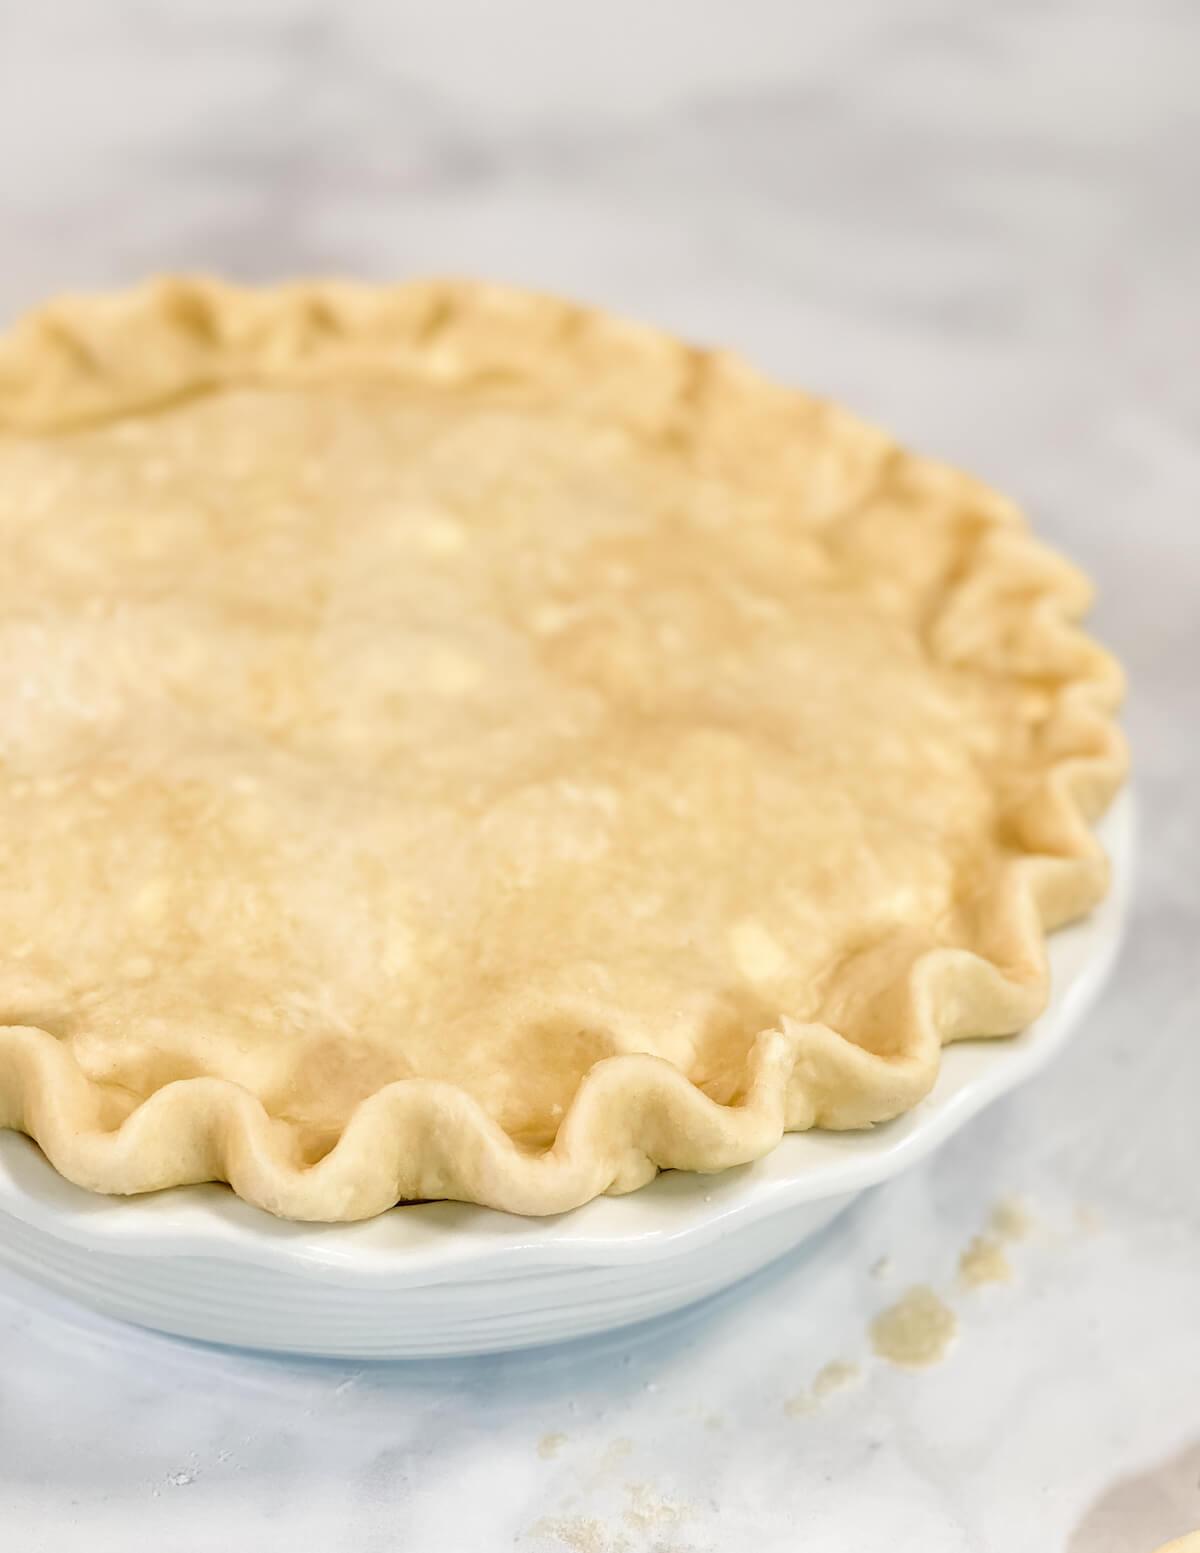 crimped pie crust in white pie plate